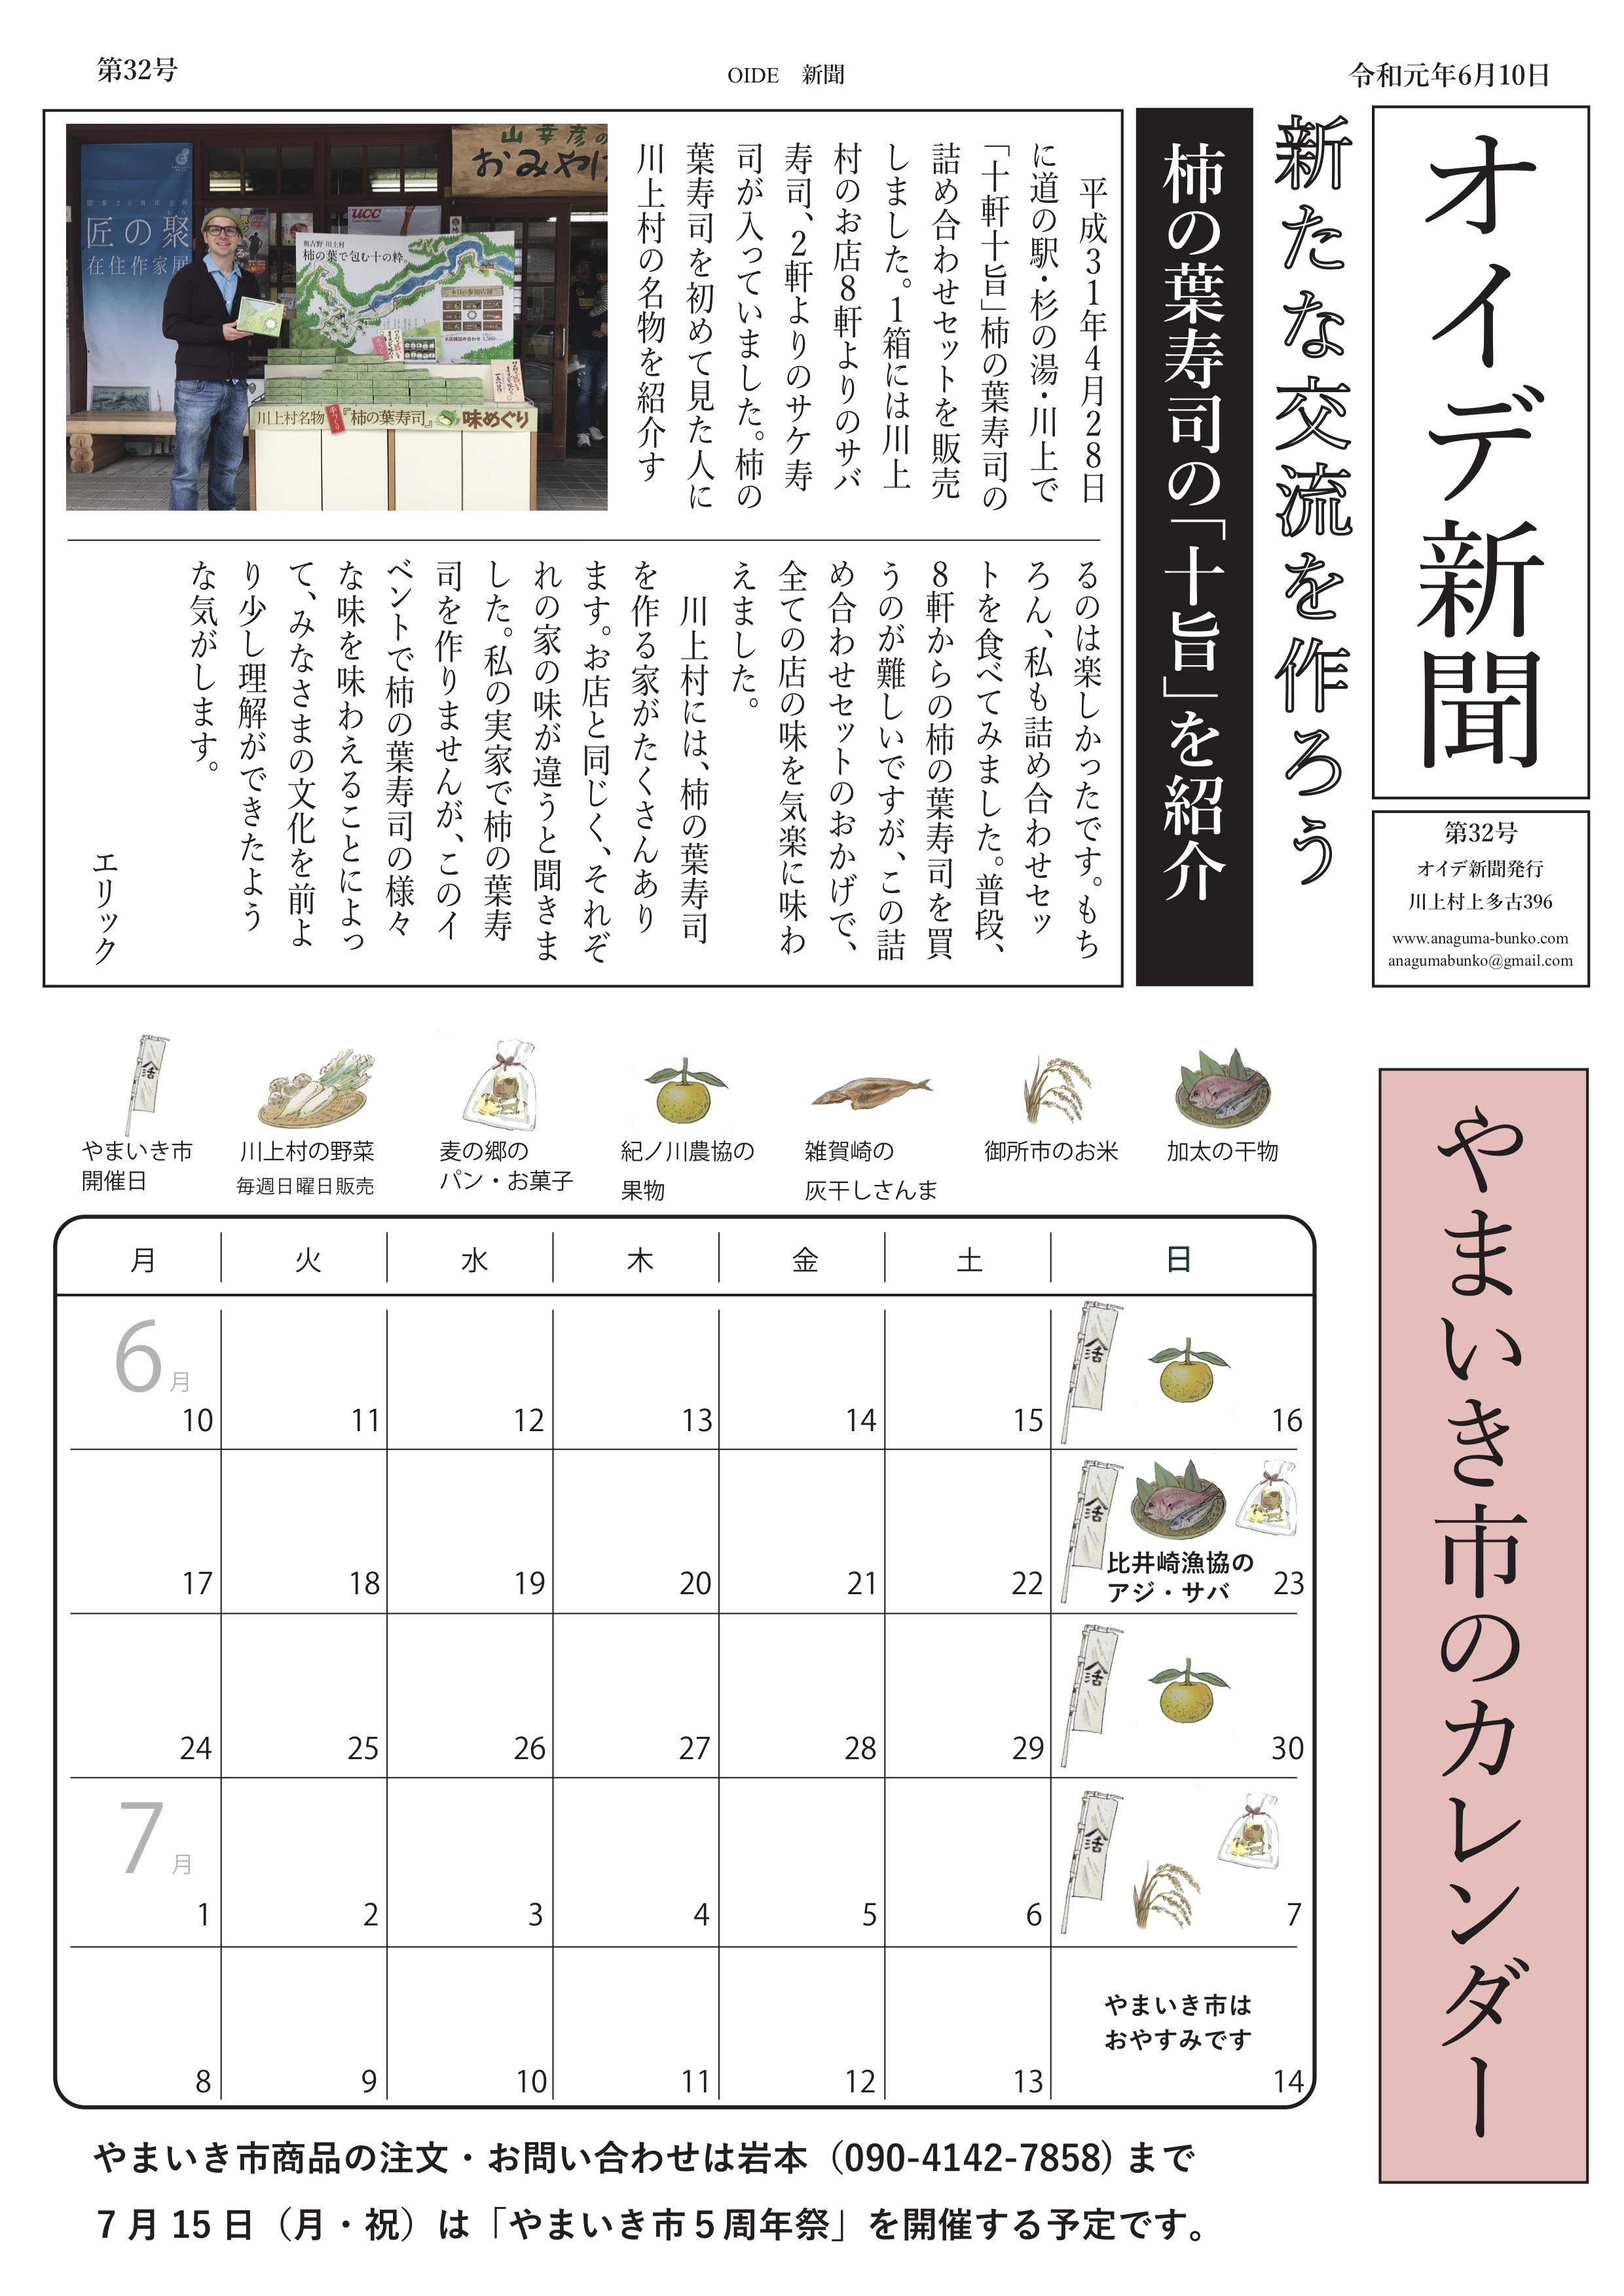 oide新聞令和元年6月号表.jpg